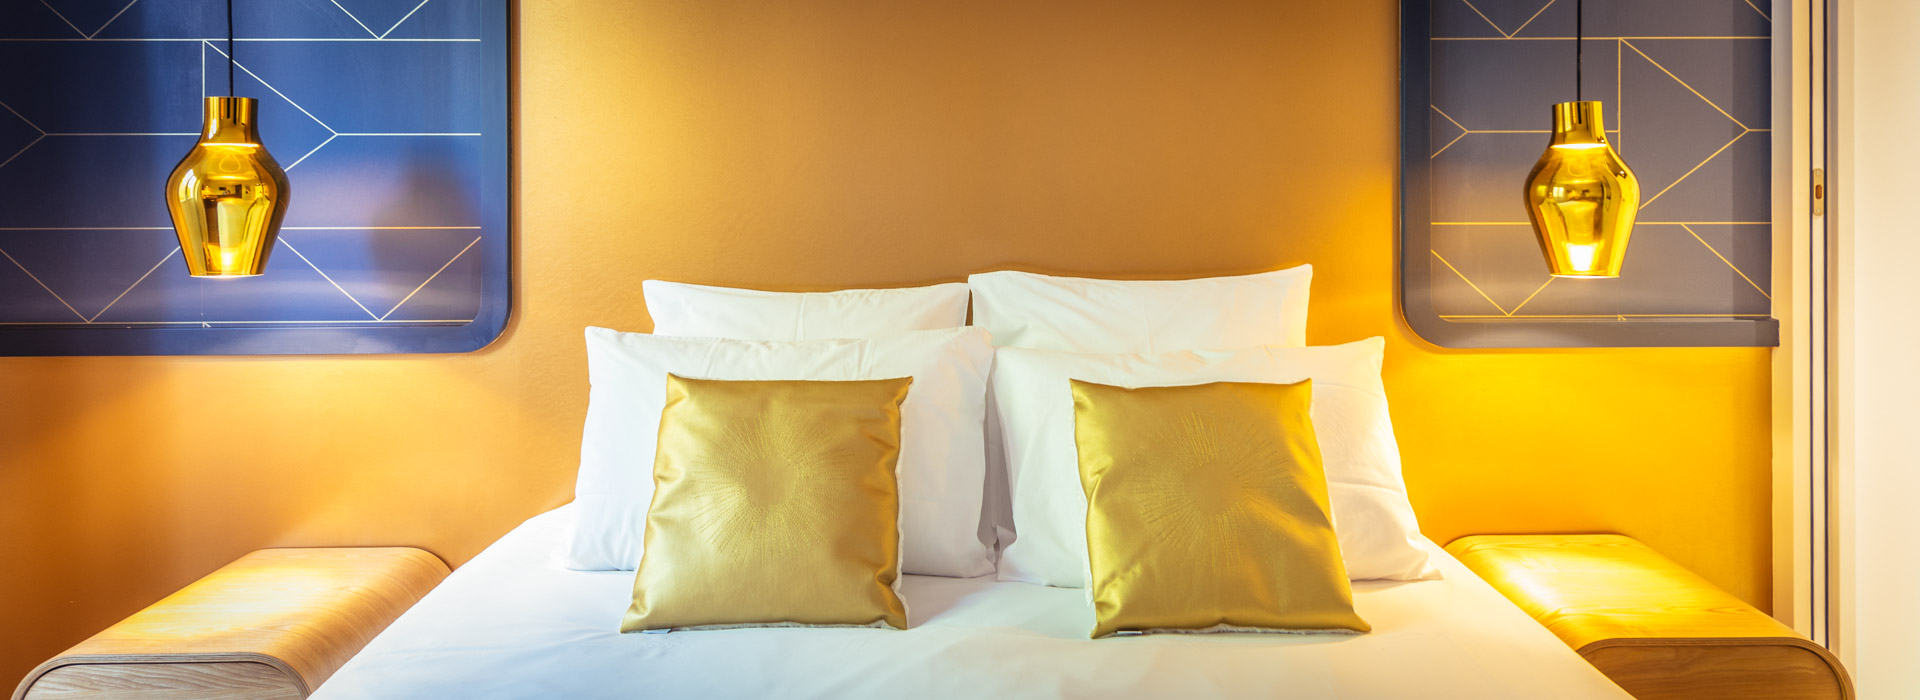 Chambre Hotel Saumur Pmr